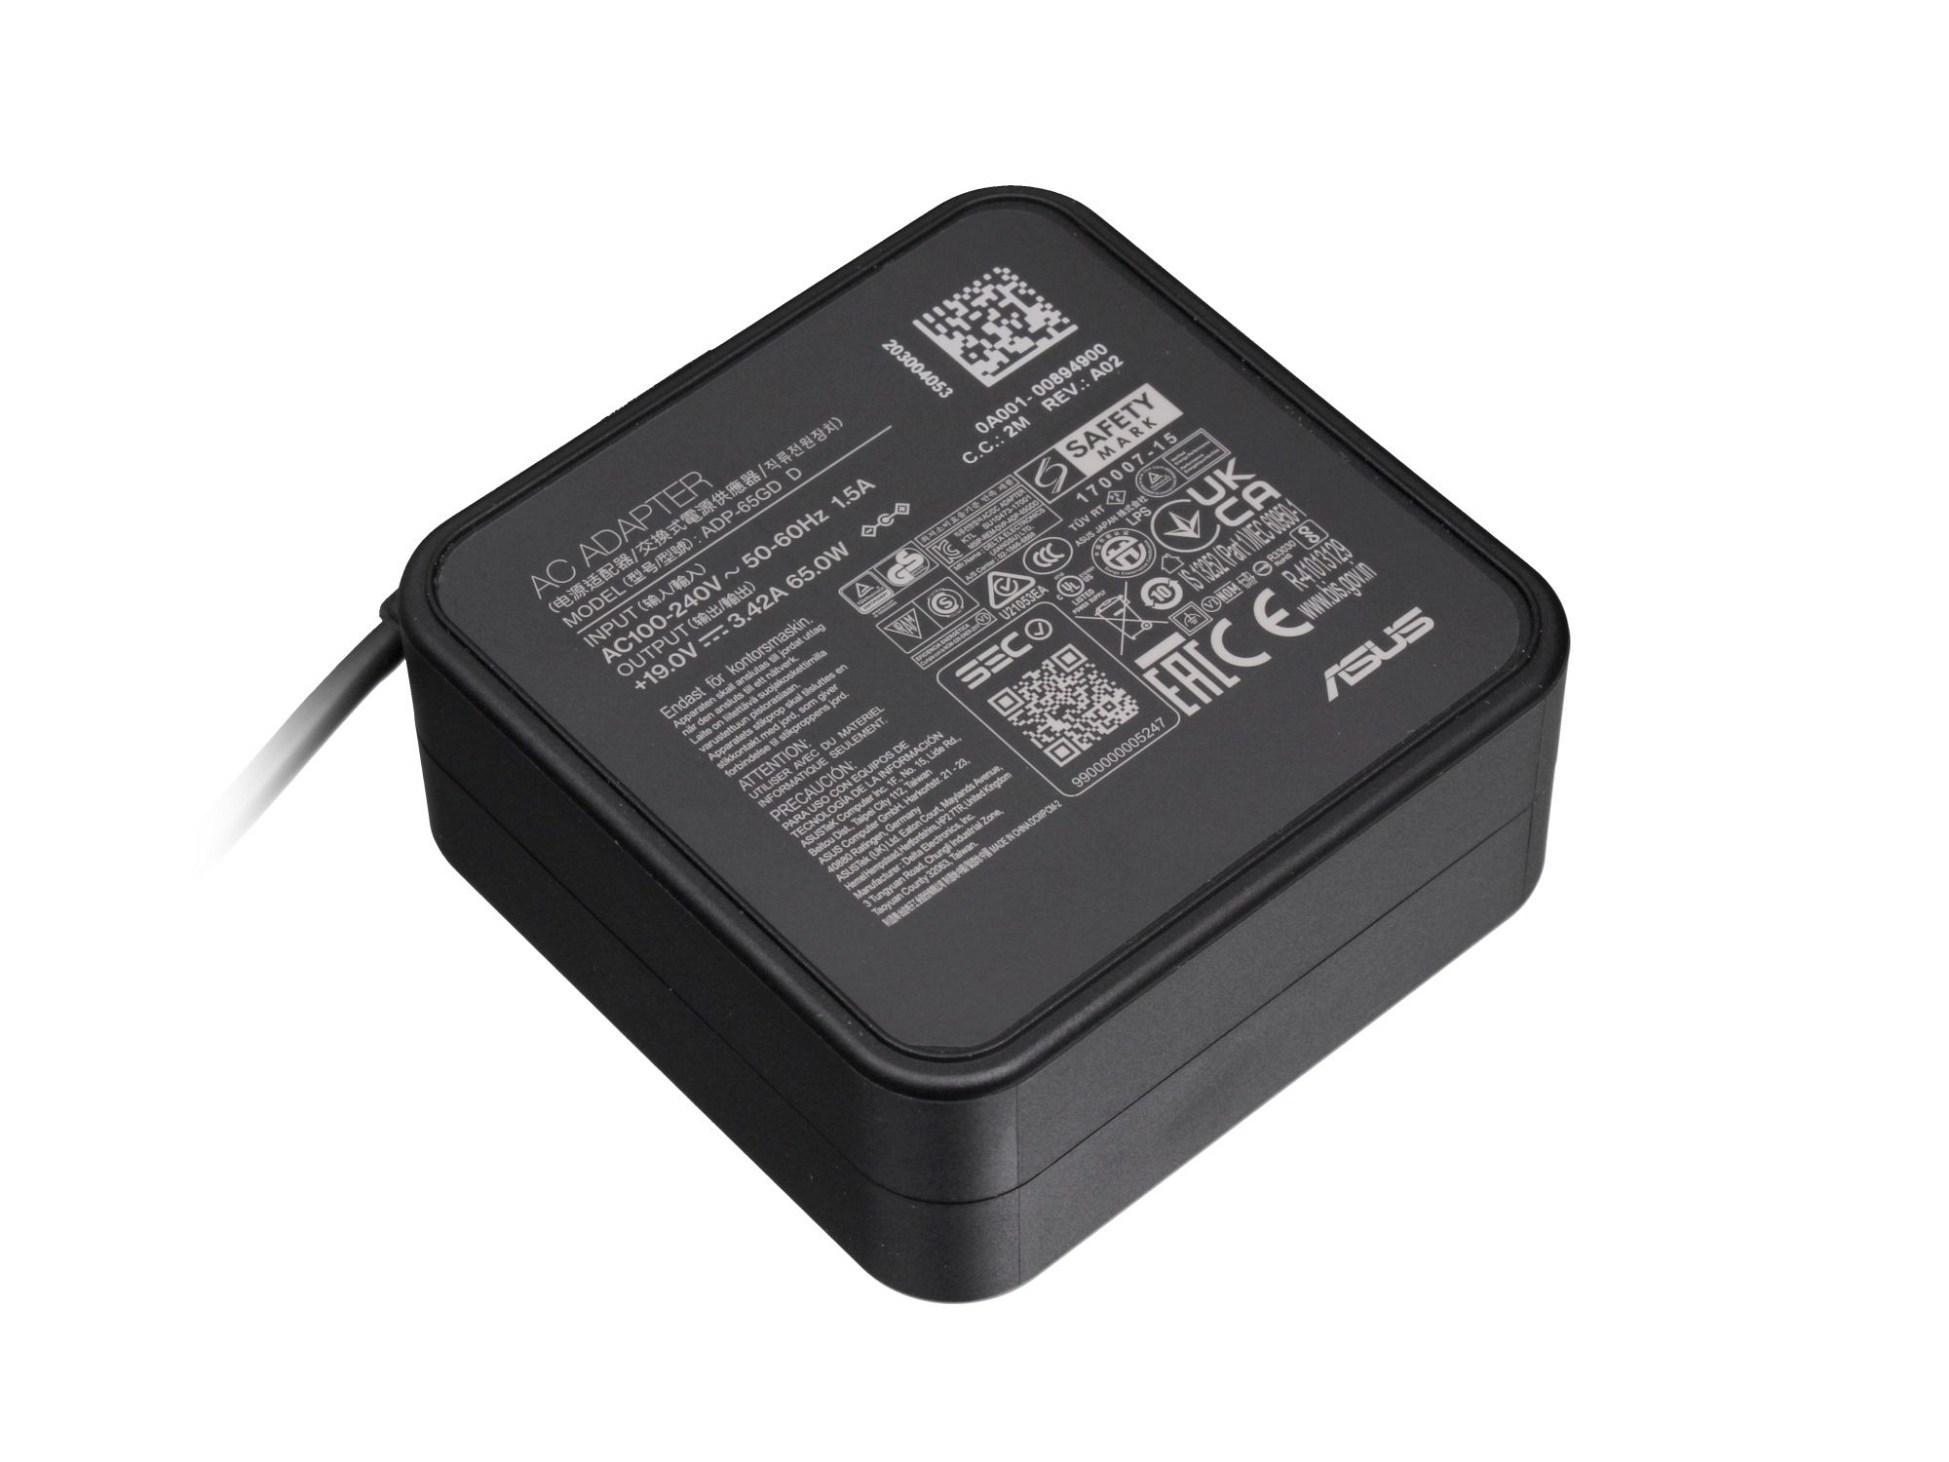 ENERTRONIX EXA0703YH Netzteil 65 Watt rund - Original